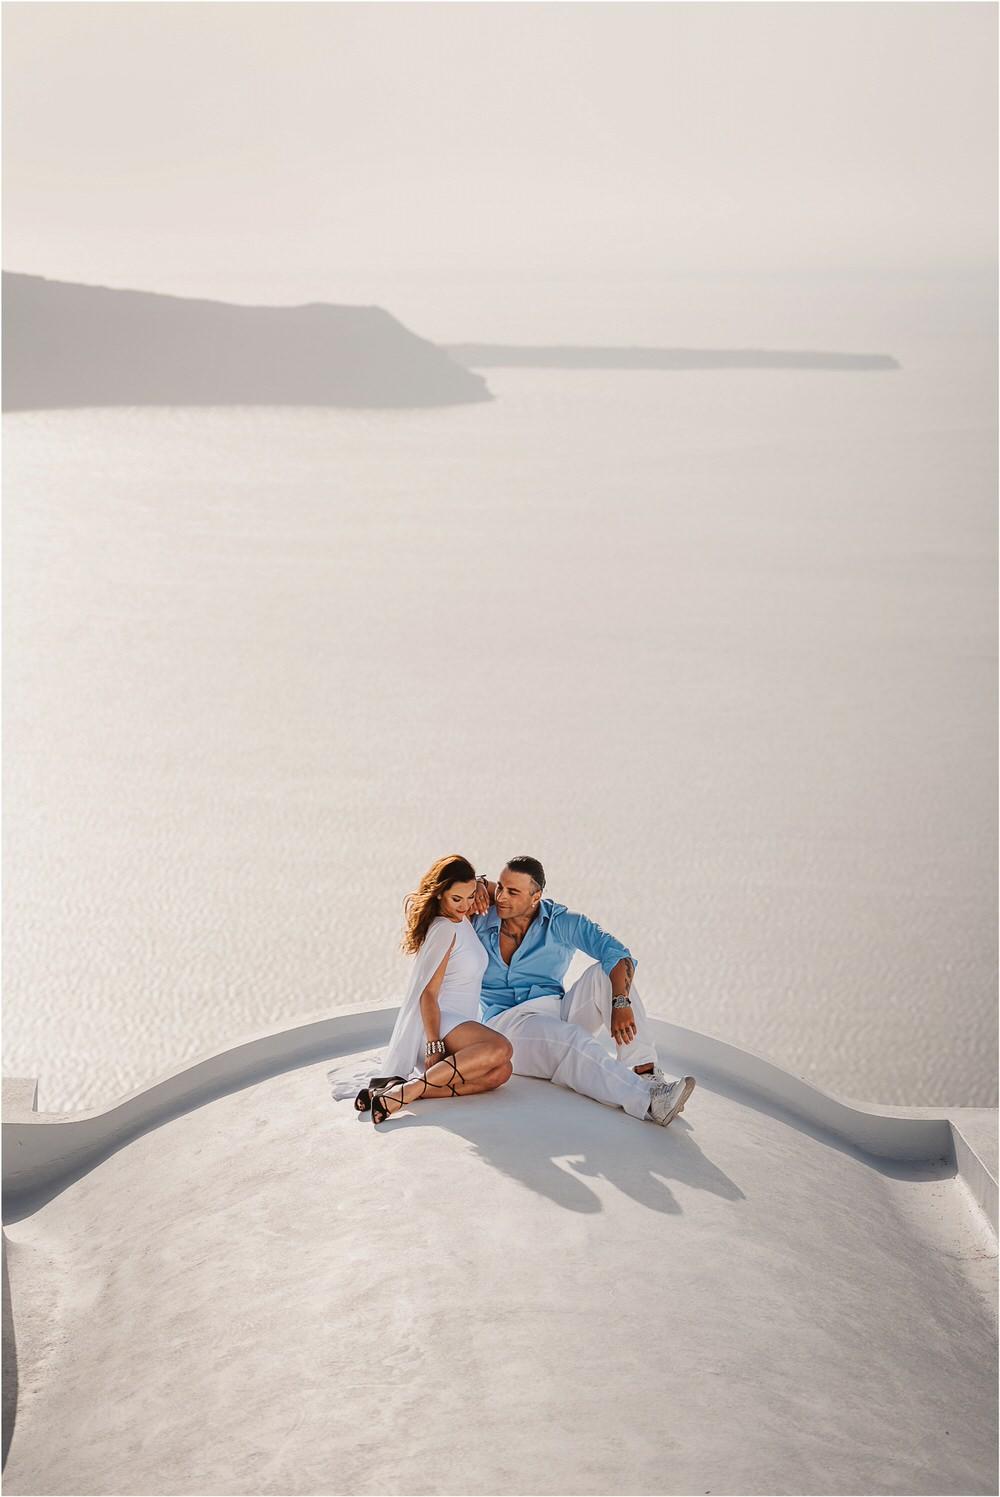 Tuscany wedding photographer destination italy italia france greece santorini 0127.jpg